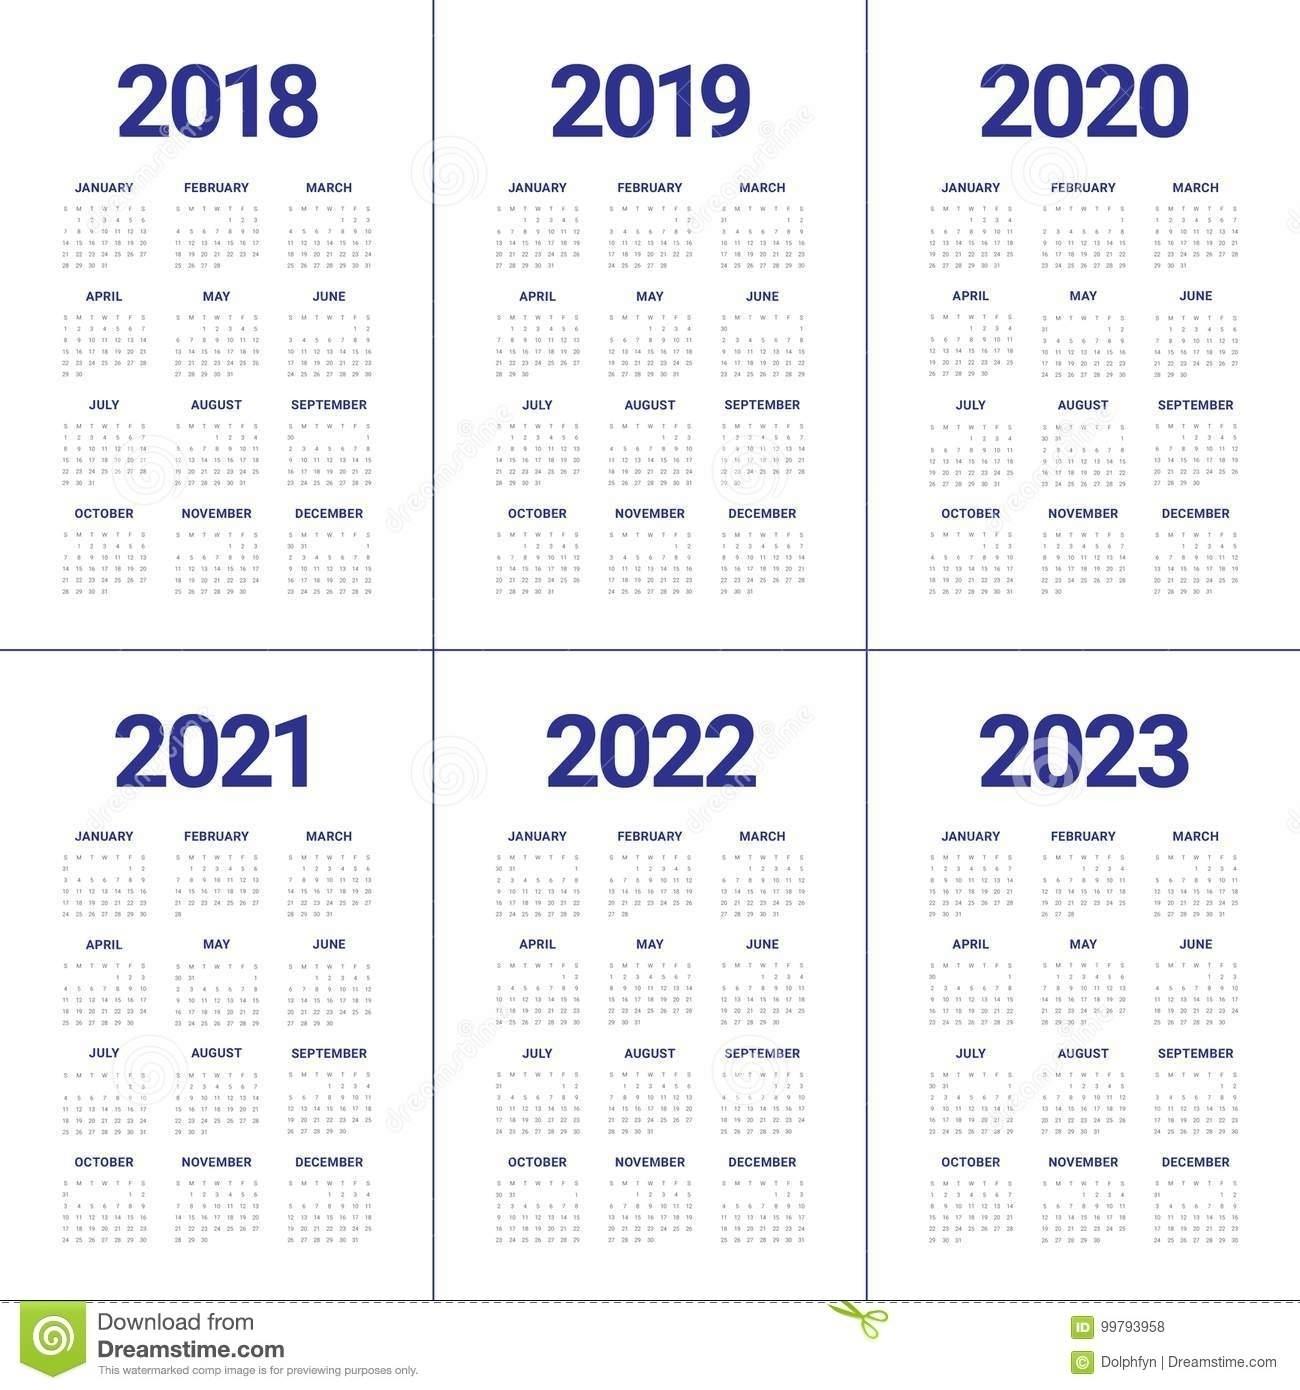 Catch 3 Year Printable Calendar 2021 2022 2023